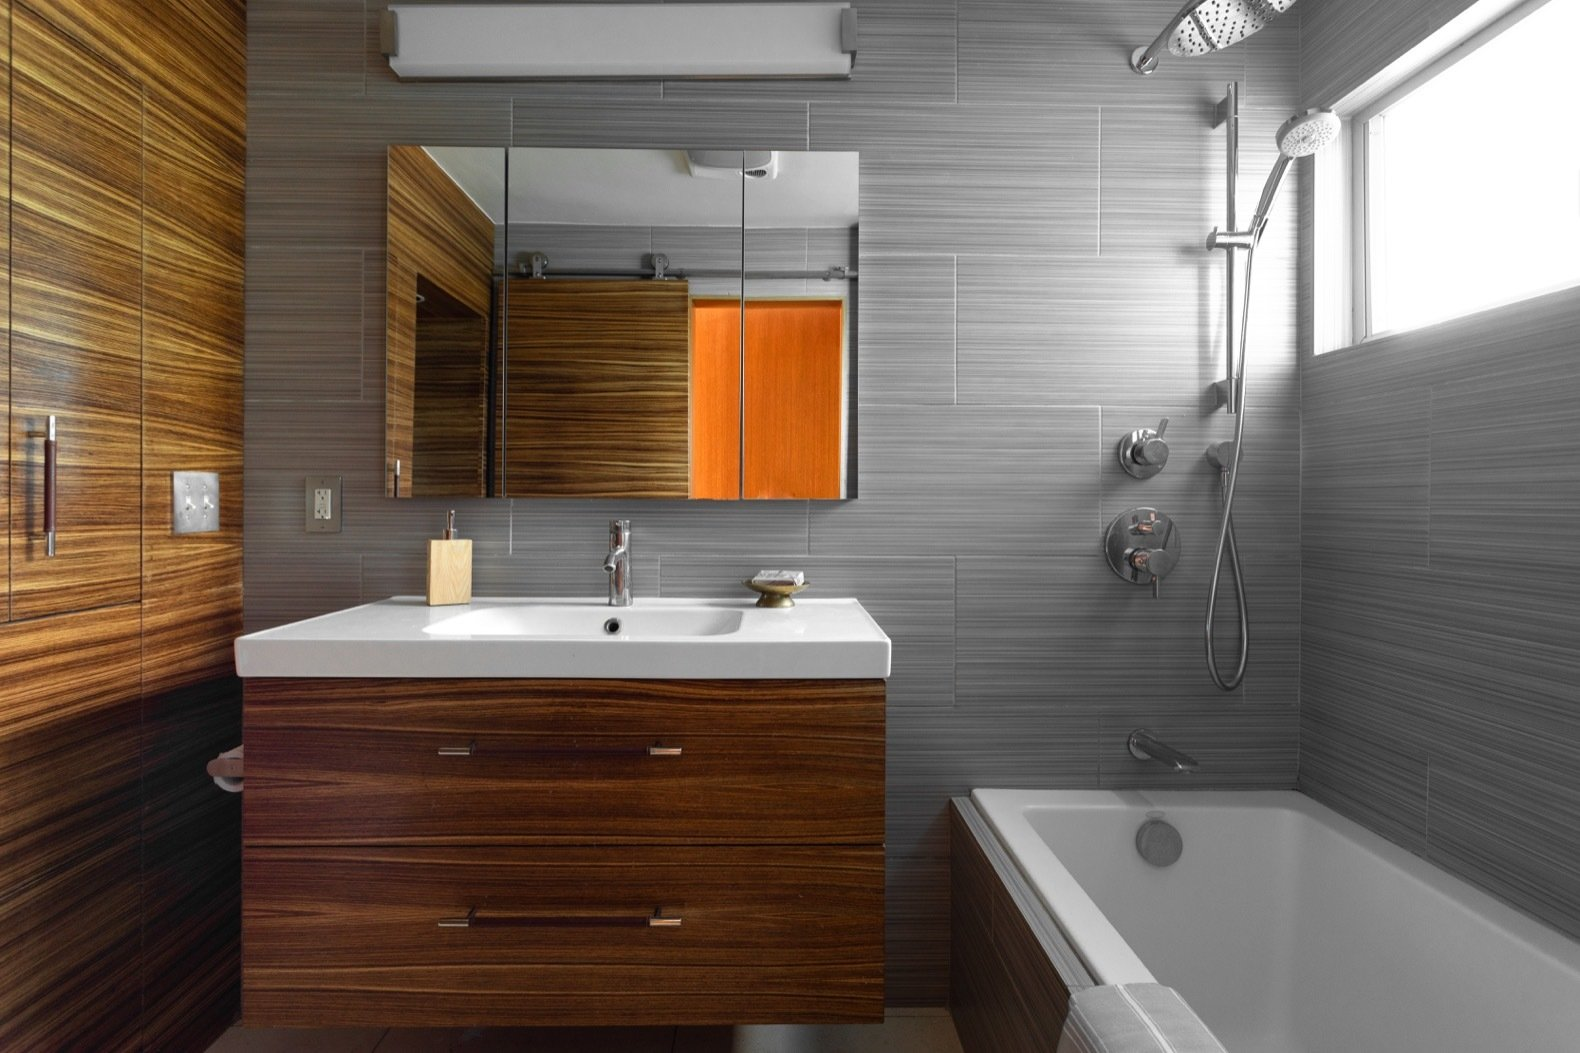 John Kewell midcentury home bathroom